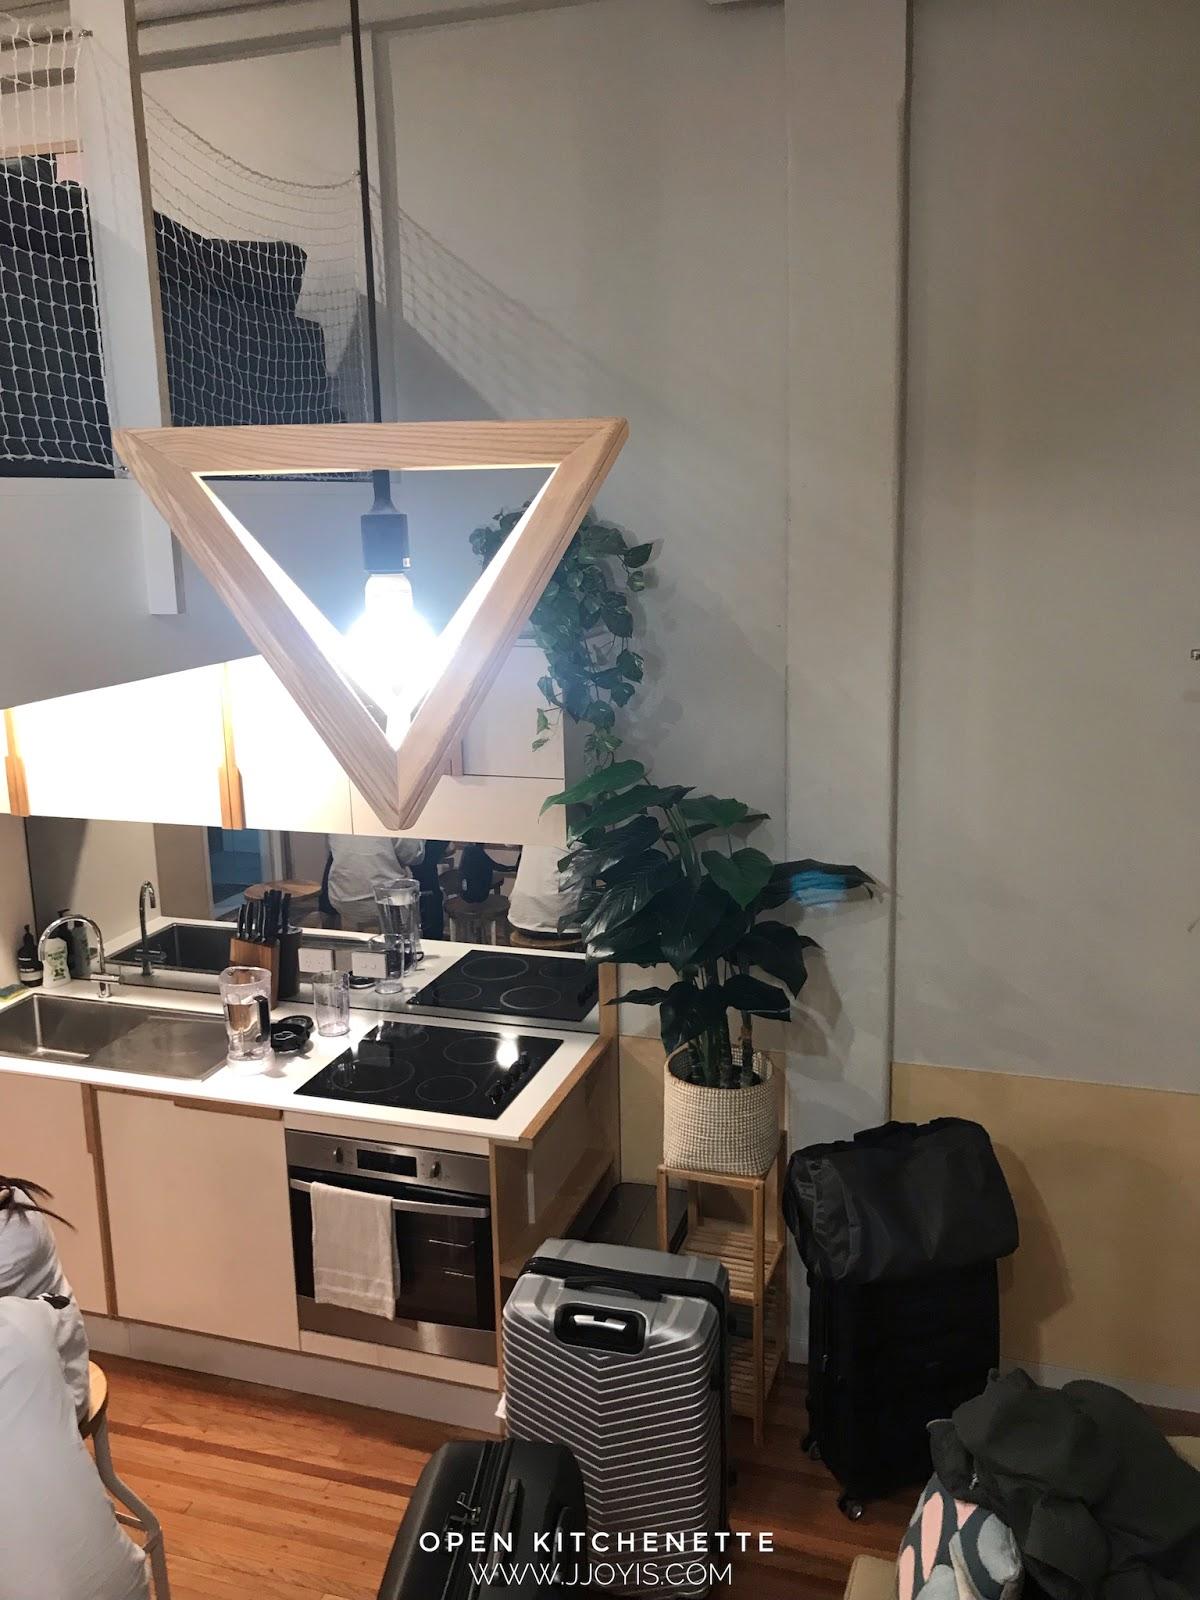 Airbnb for large groups (sleep 7) in Brisbane CBD open kitchen